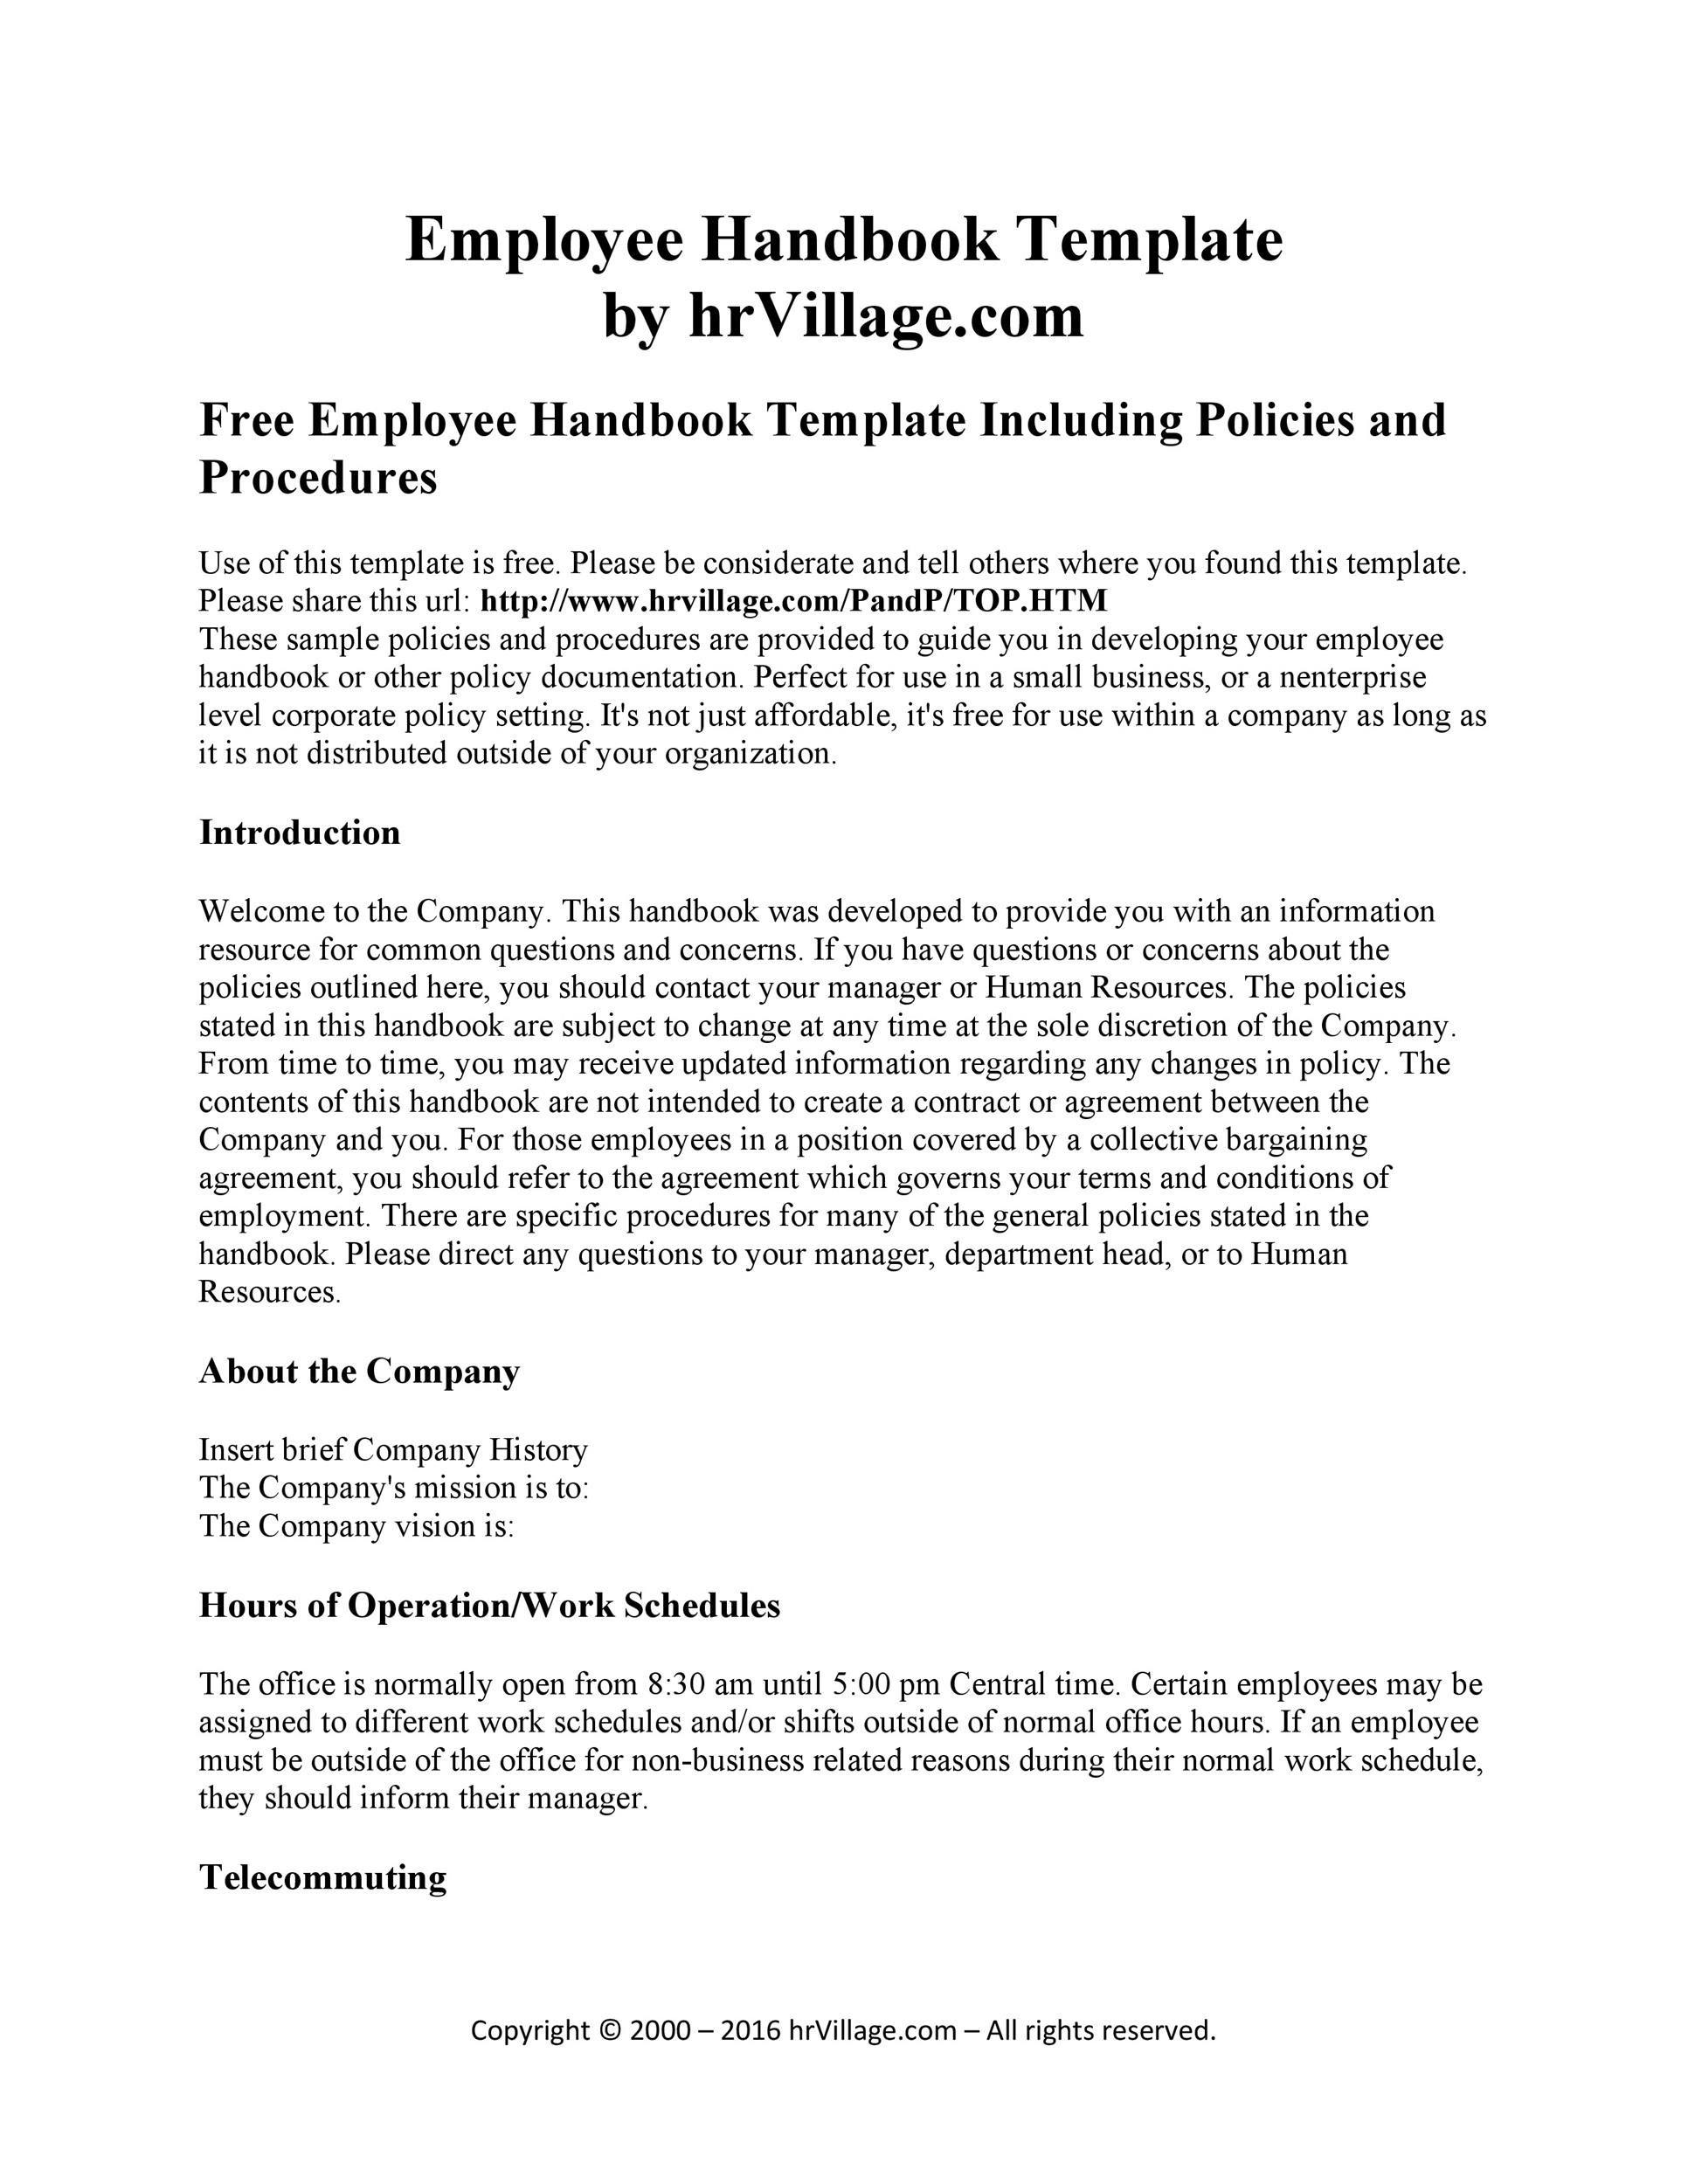 005 Shocking Free Employment Handbook Template Idea Full